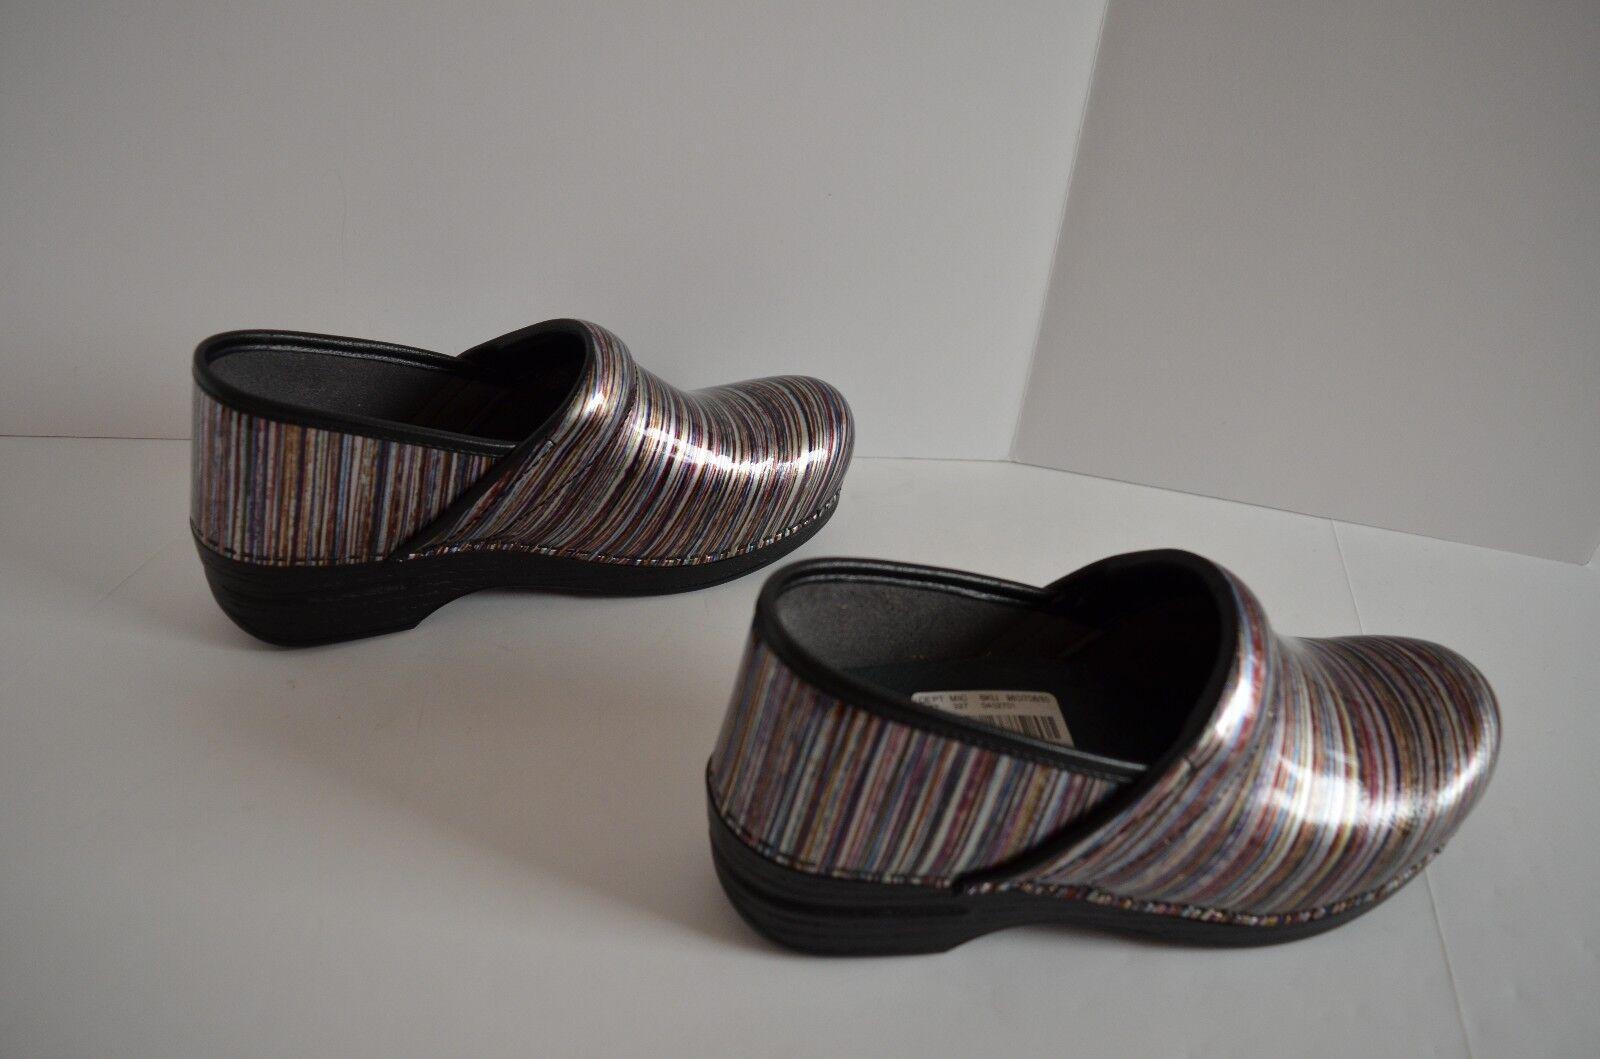 NEW DANSKO XP Professional bluee Stripe Patent Leather Clog Comfort shoes Sz 11.5